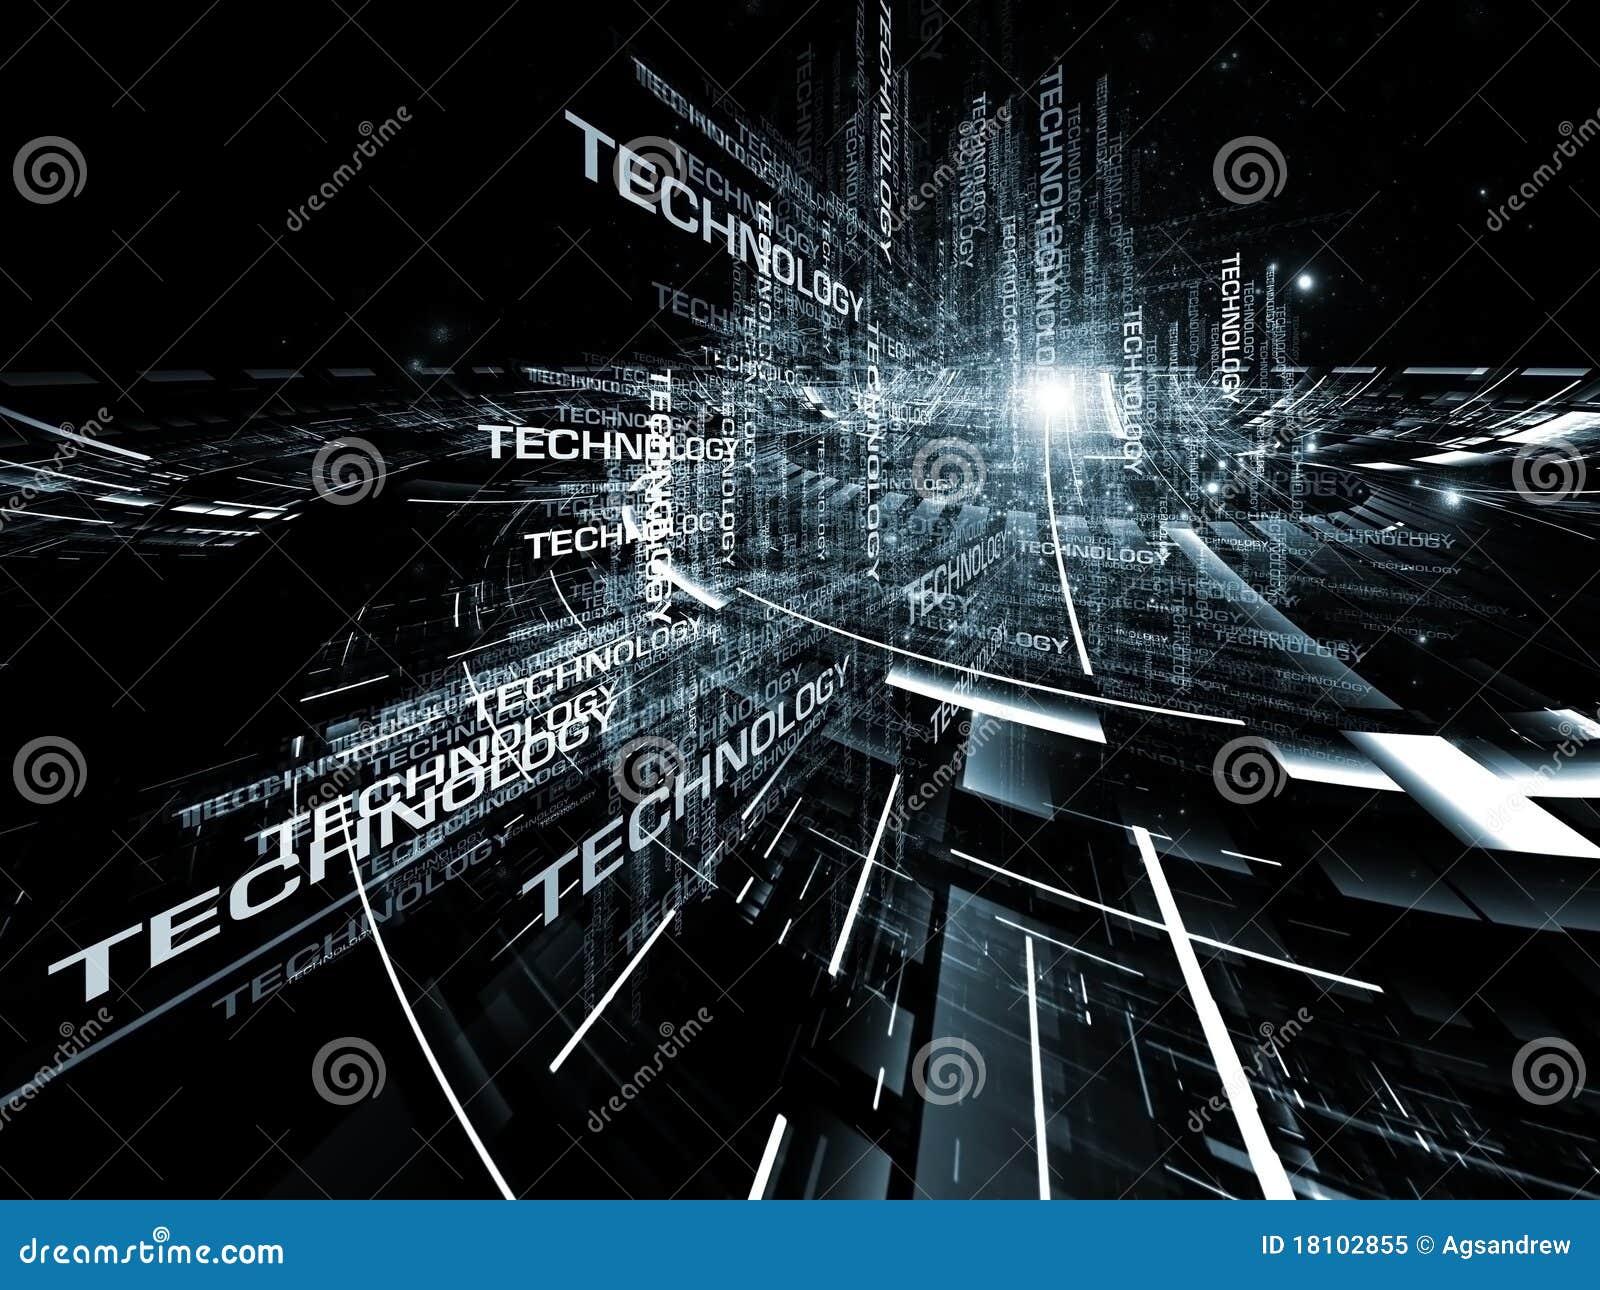 About modern technology